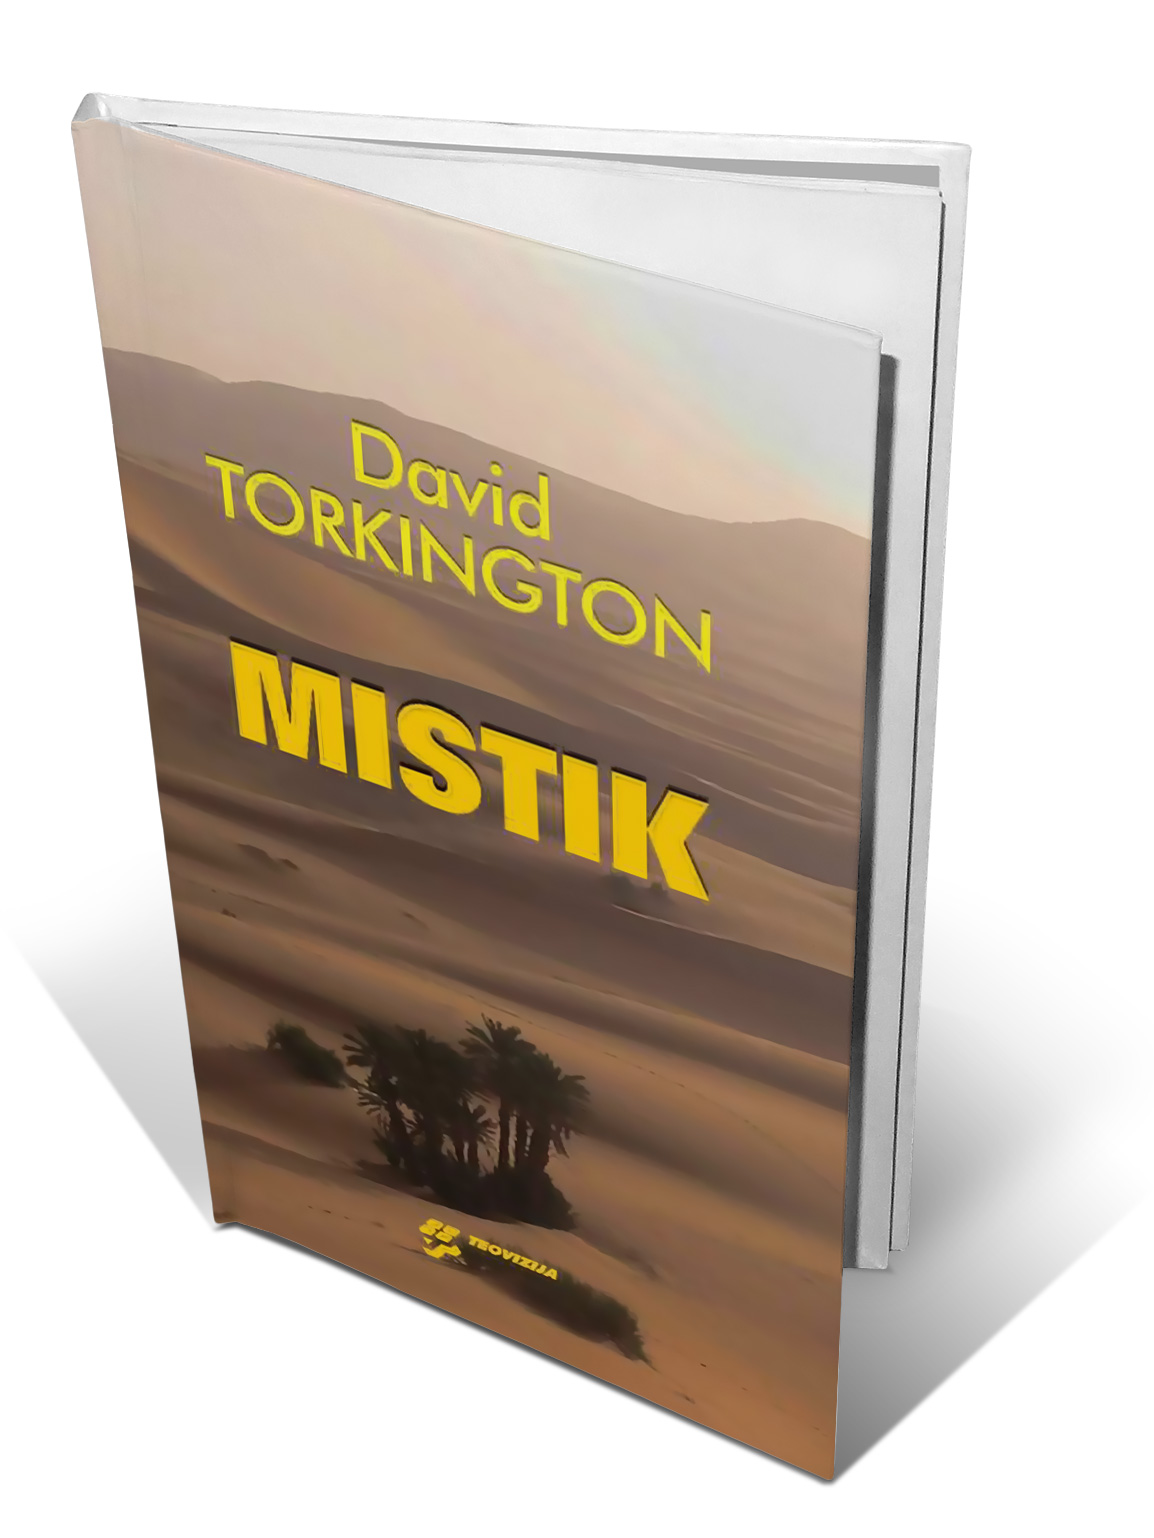 MISTIK - David Torkington